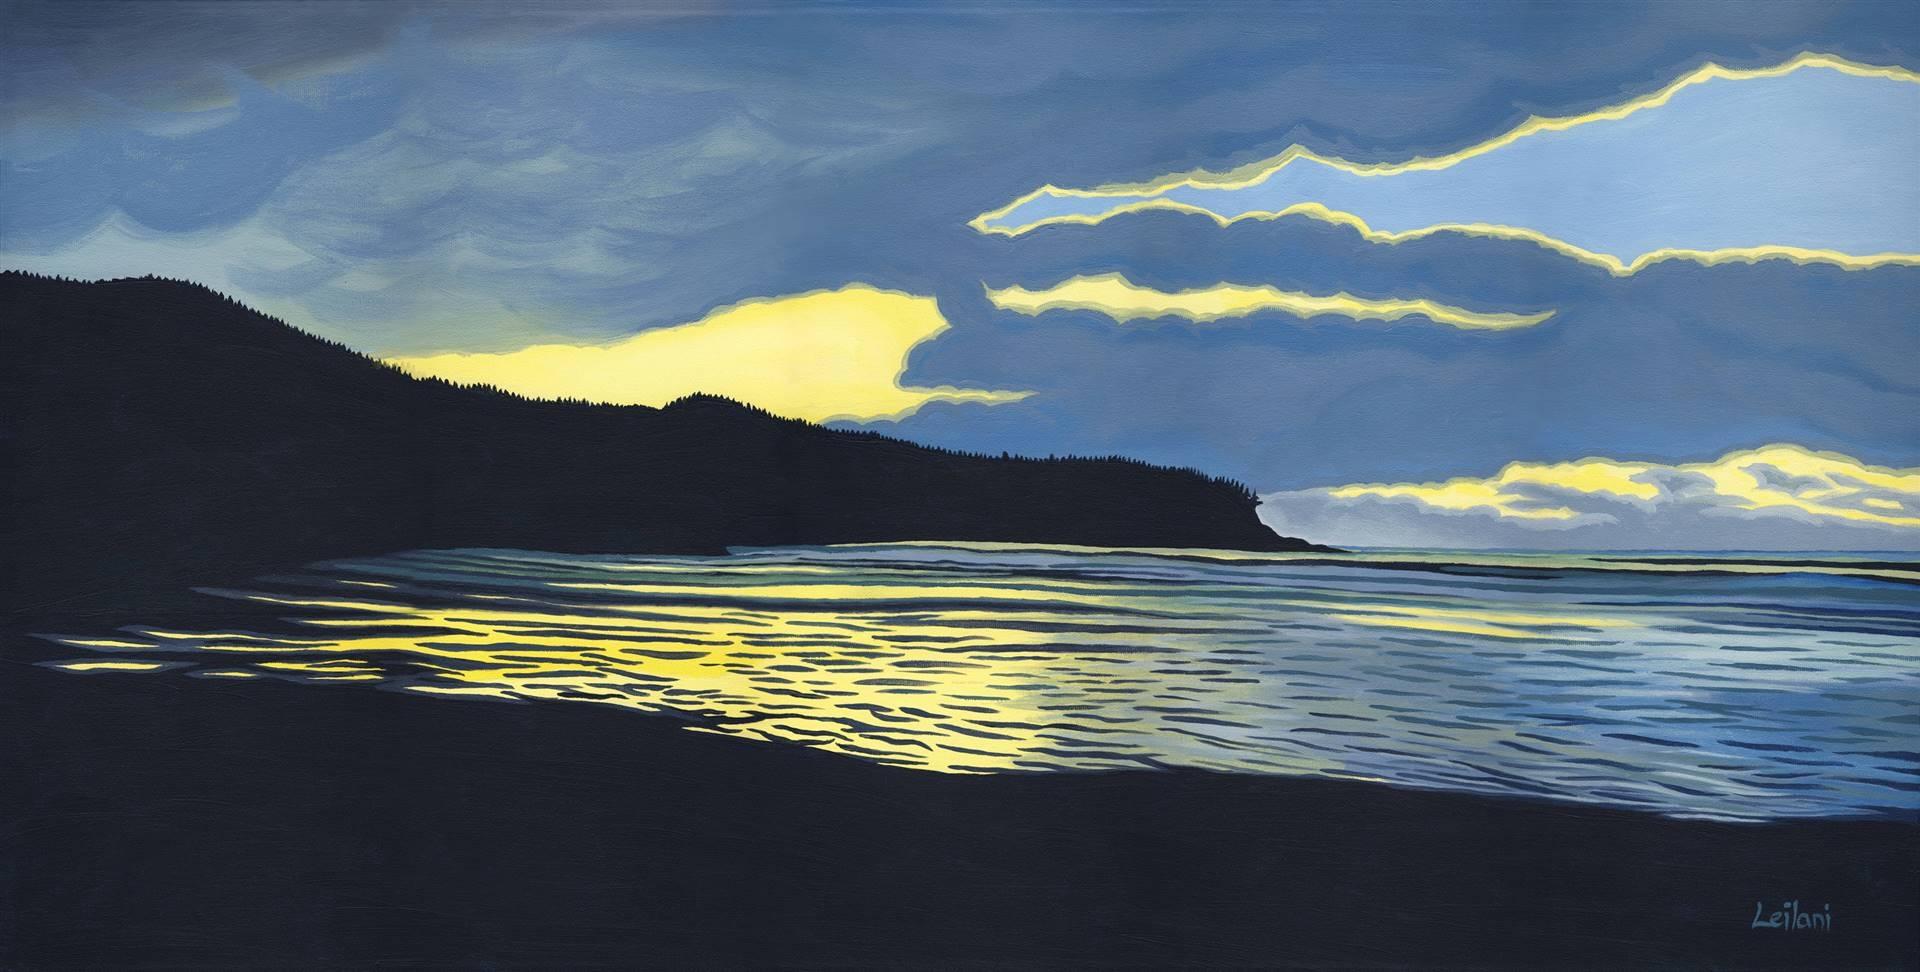 Leilani, Cox Bay Reflections, Acrylic on Canvas, 18x36 image